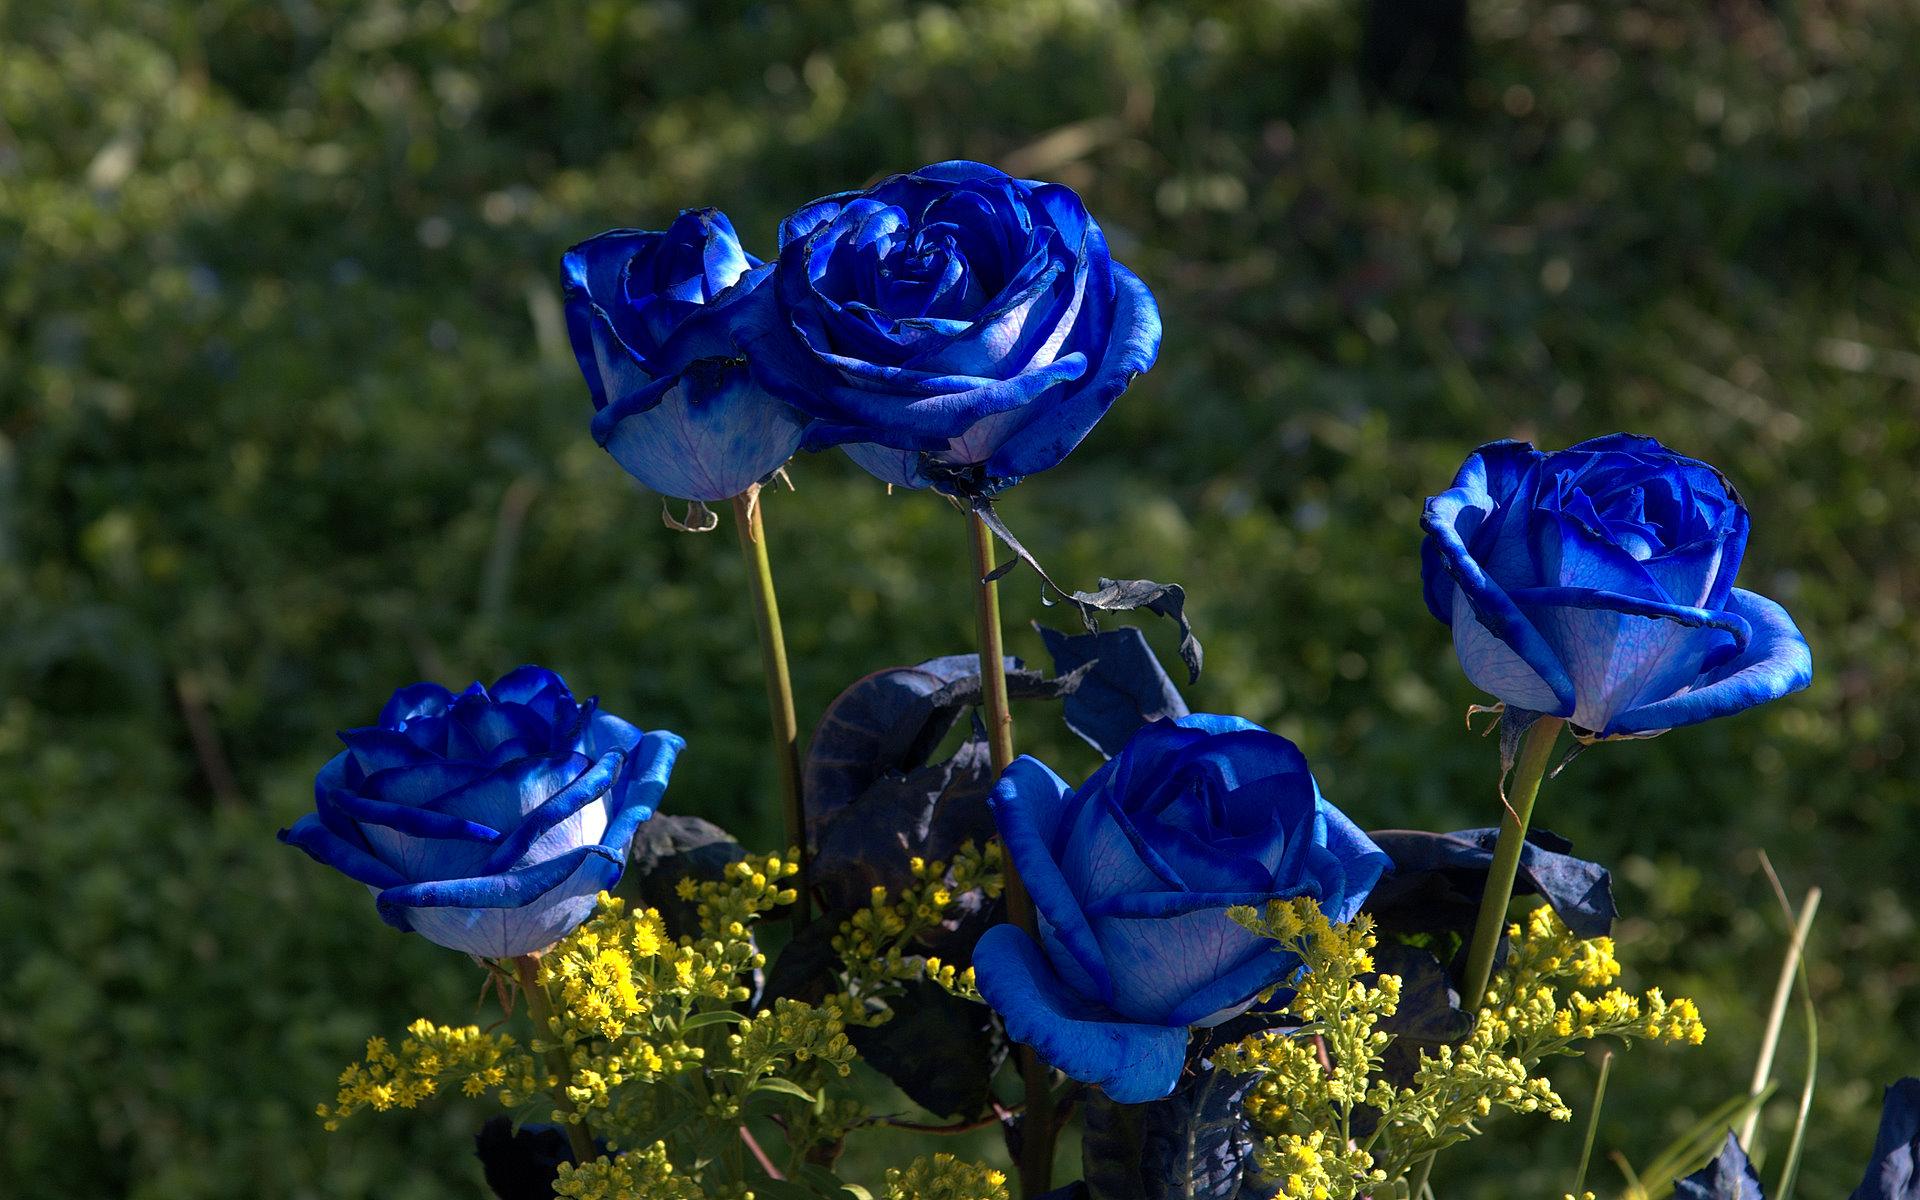 Tumblr Wallpaper Flowers - Most Beautiful Blue Rose Hd , HD Wallpaper & Backgrounds